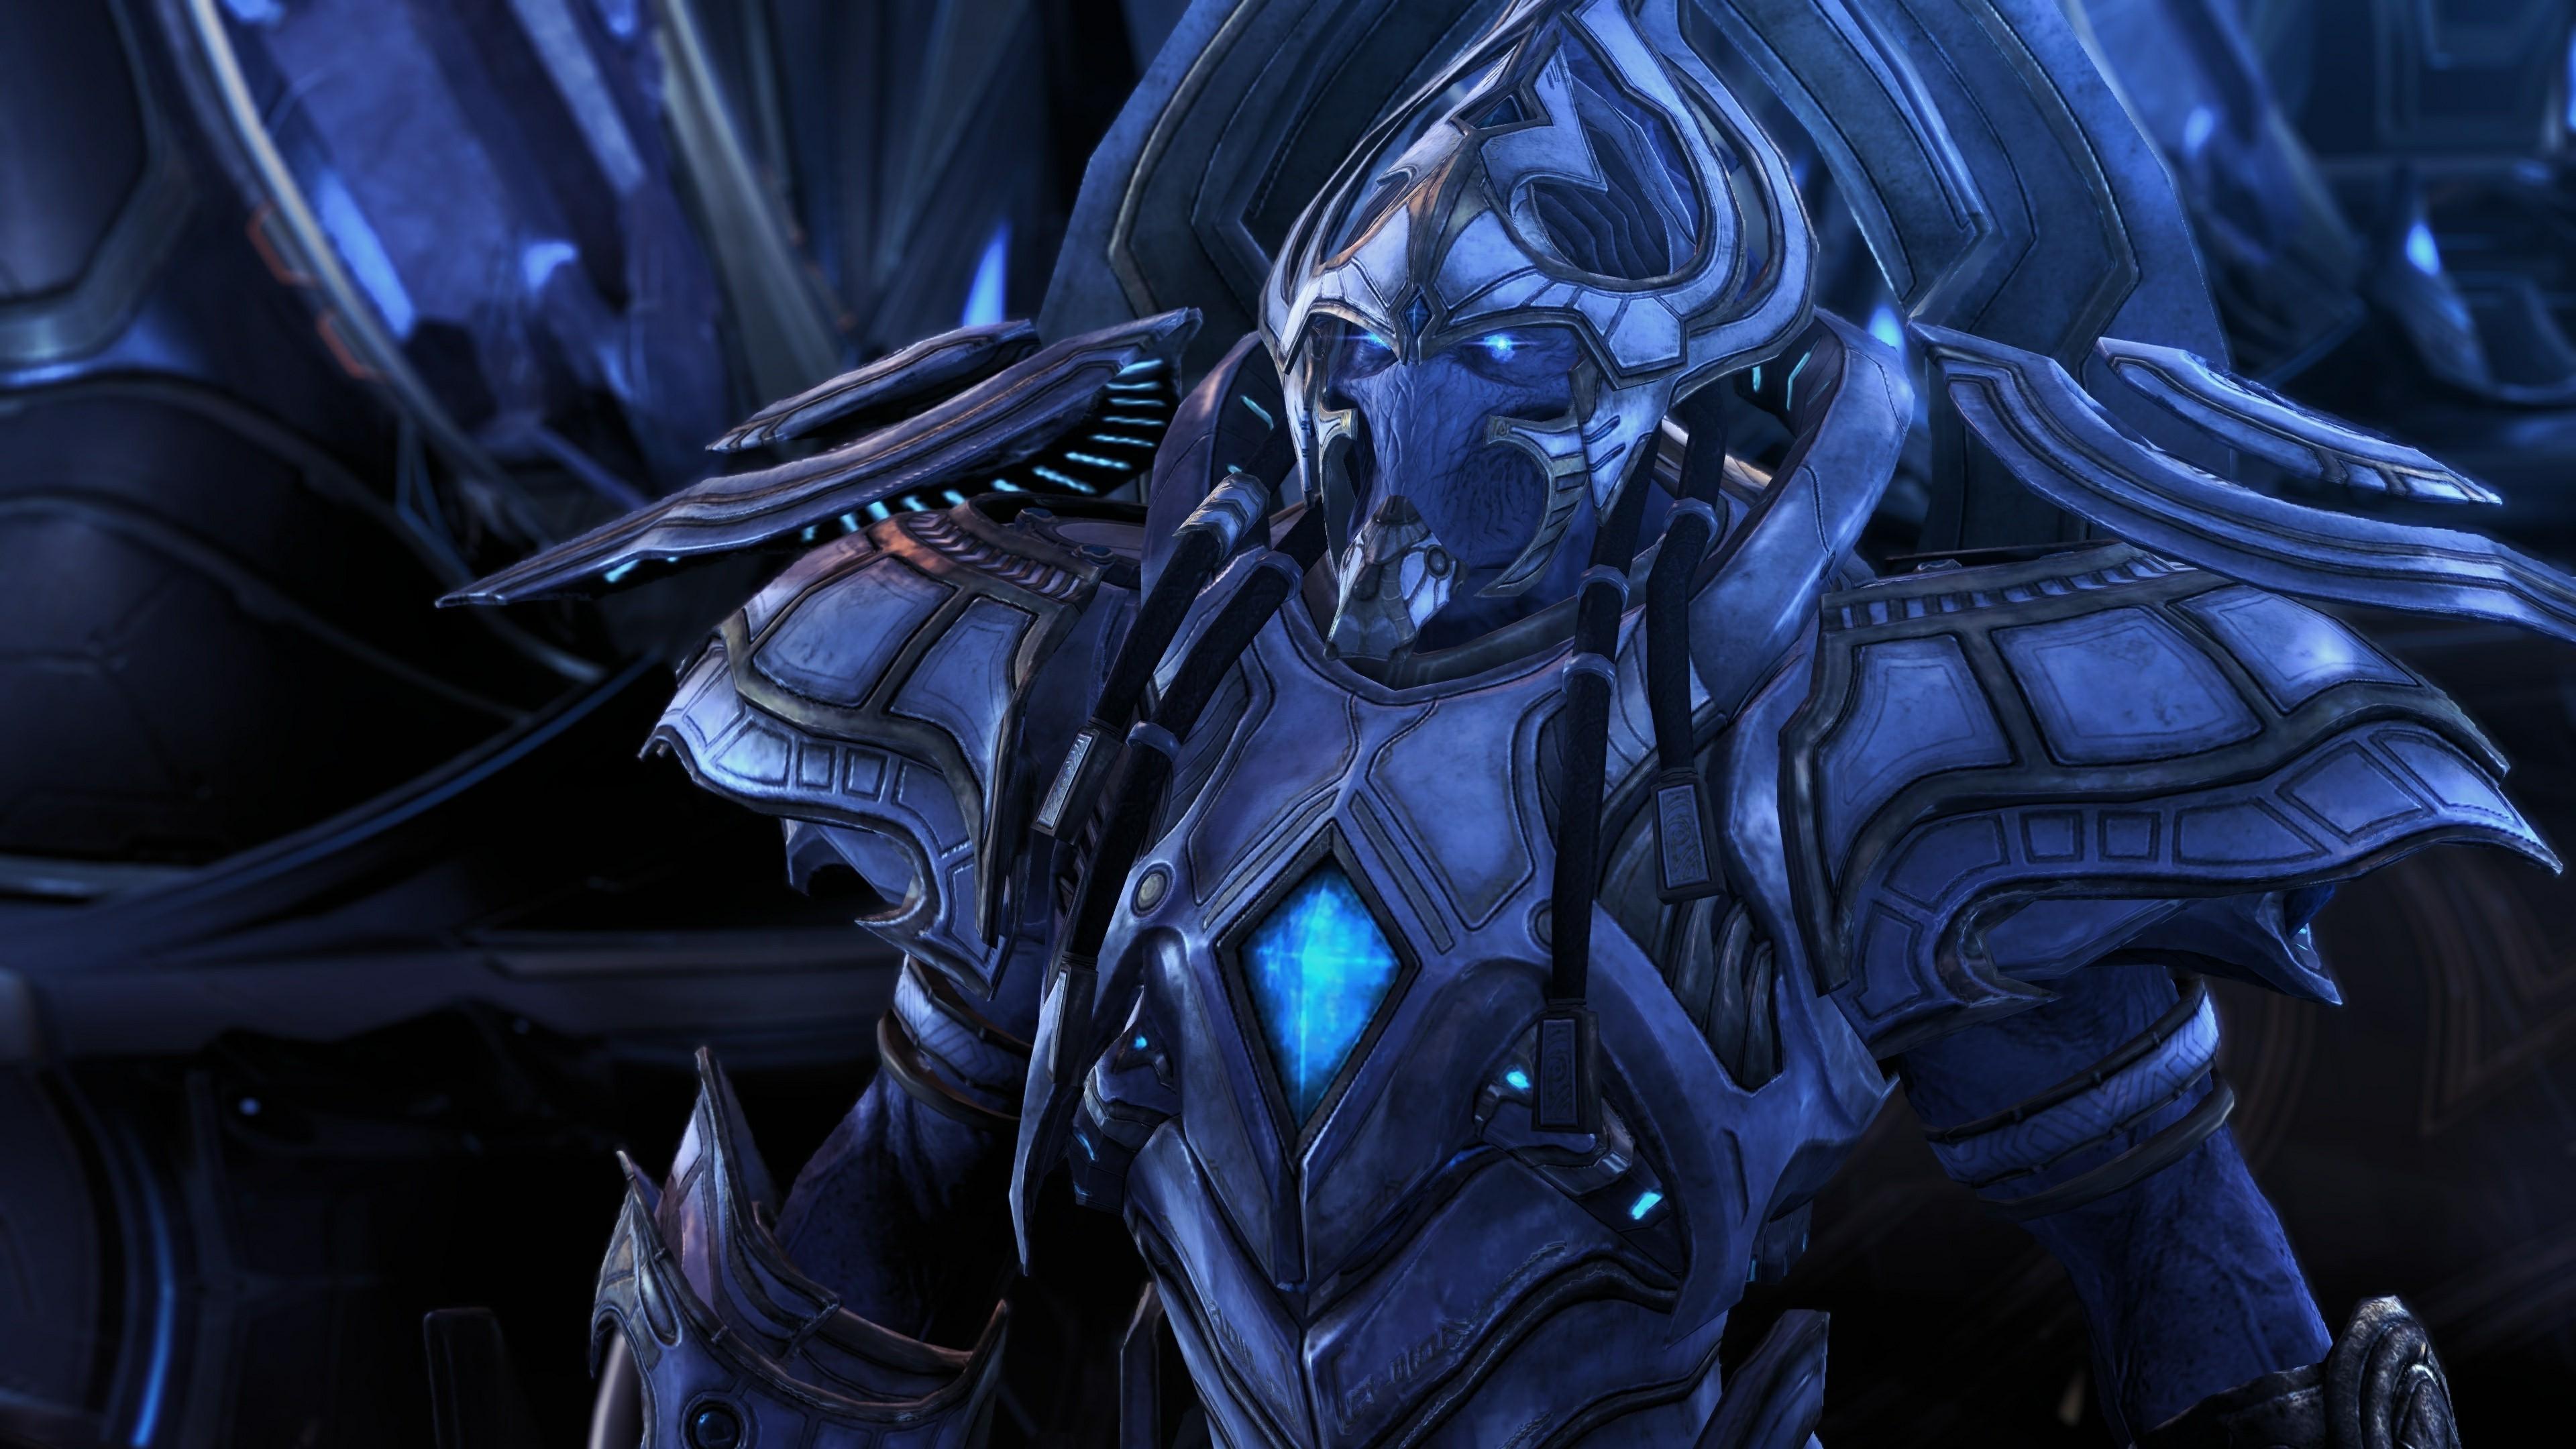 Starcraft II, Artanis, Protoss Wallpapers HD / Desktop and Mobile  Backgrounds